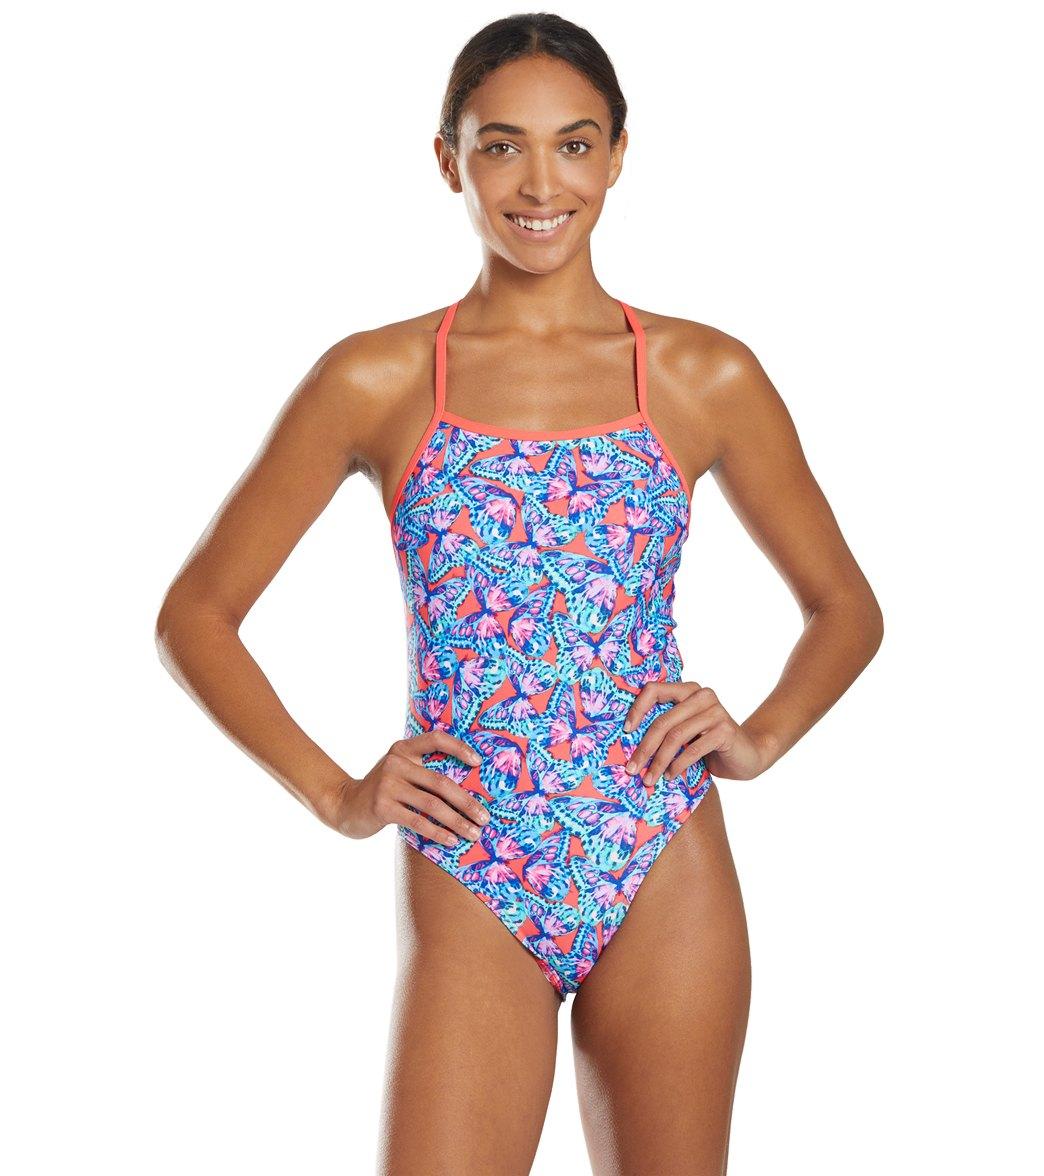 Funkita Women's Fly Free Tie Me Tight One Piece Swimsuit -